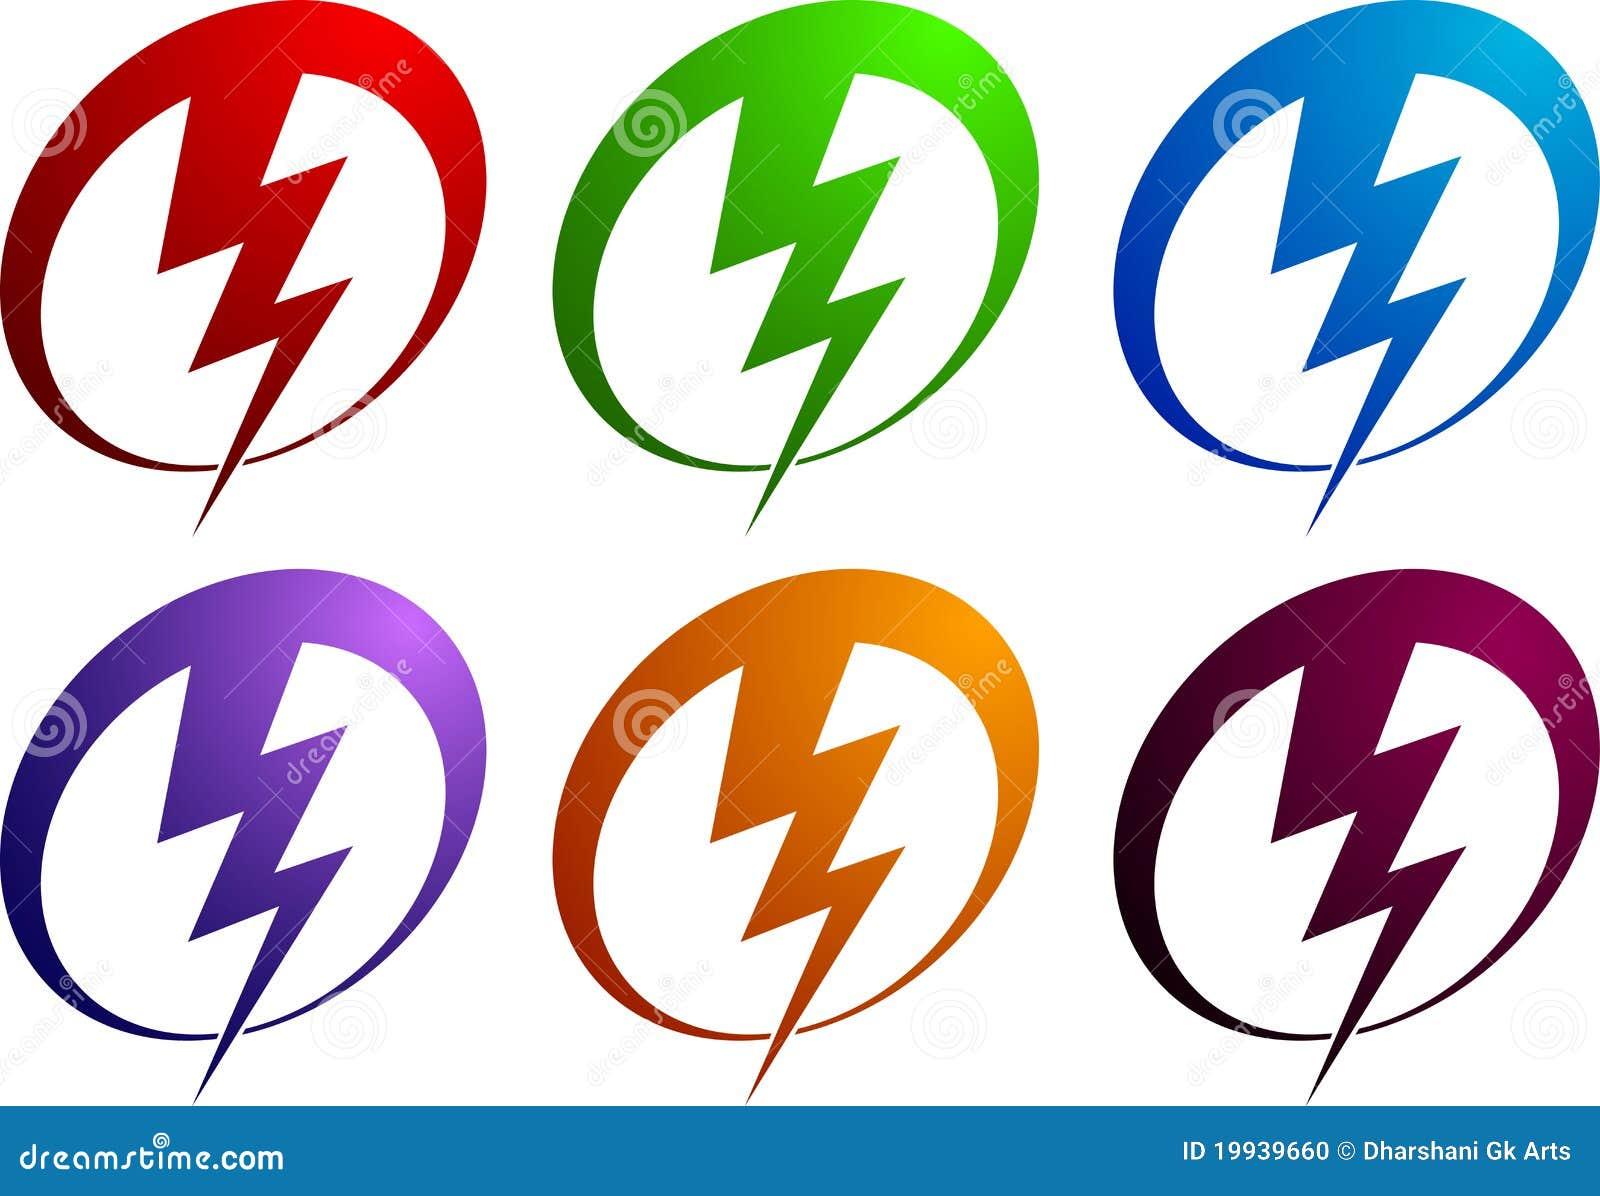 power logo stock photo image 19939660